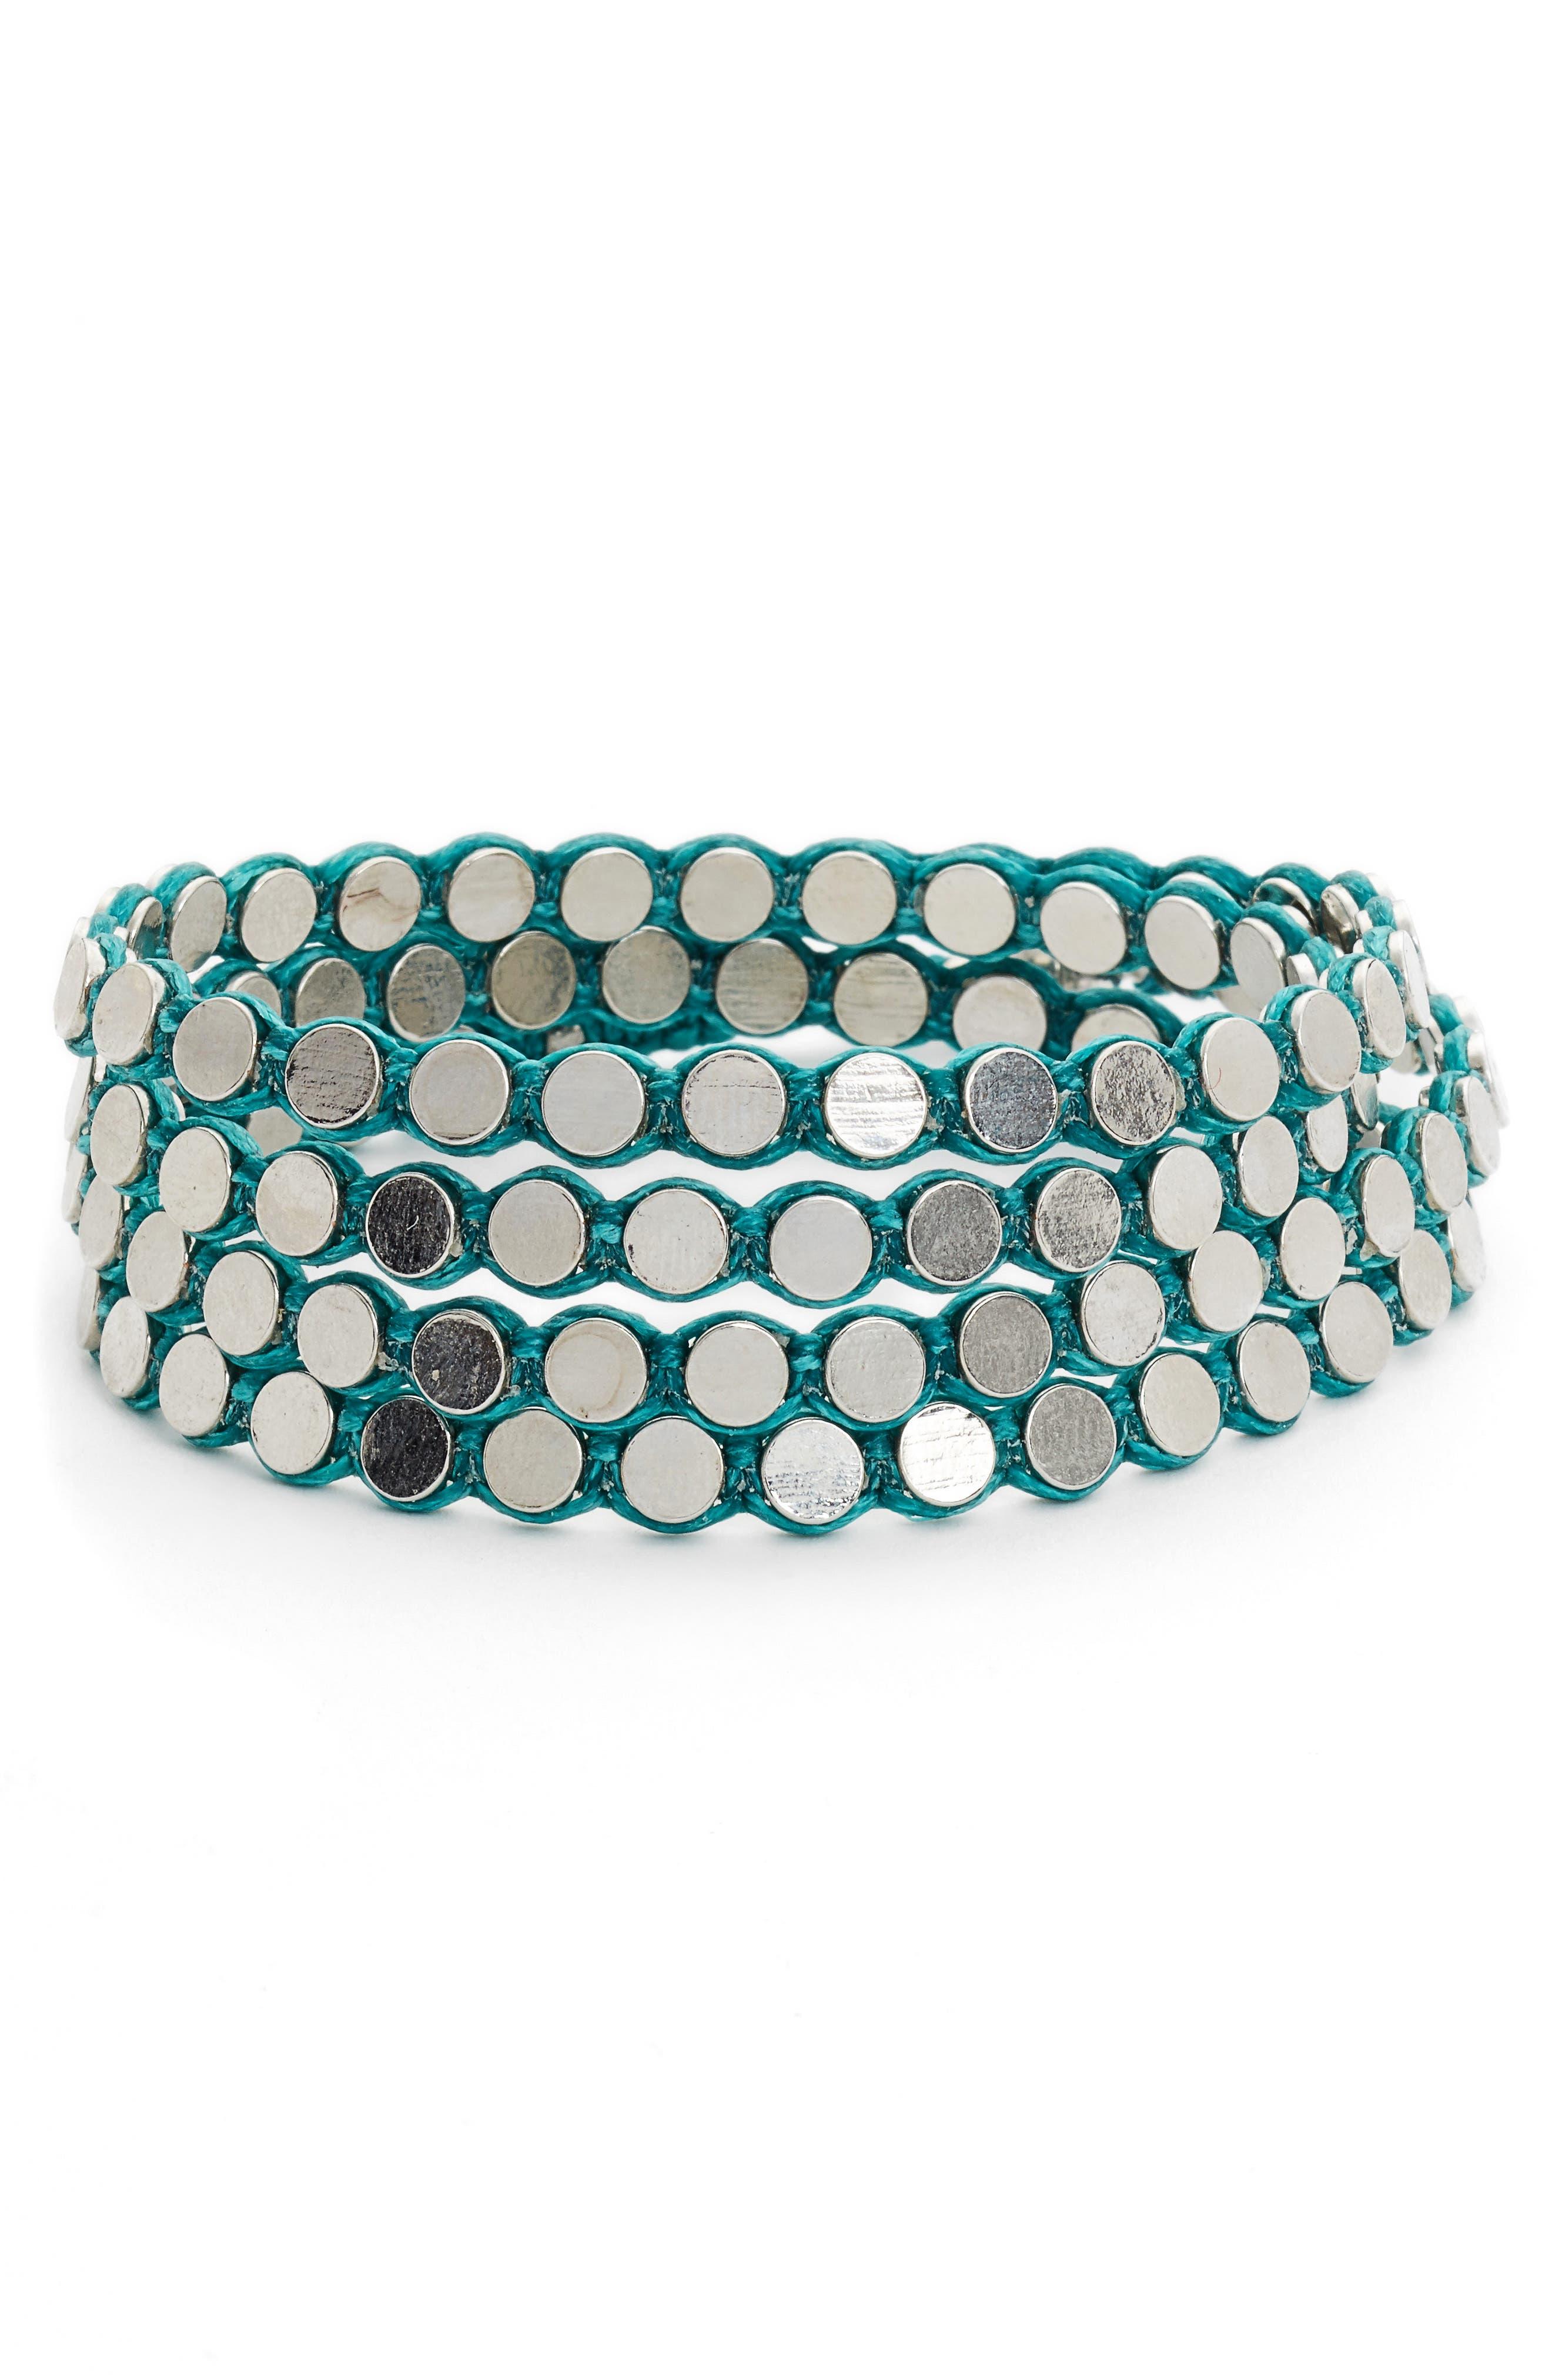 Main Image - Serefina Disk Wrap Bracelet